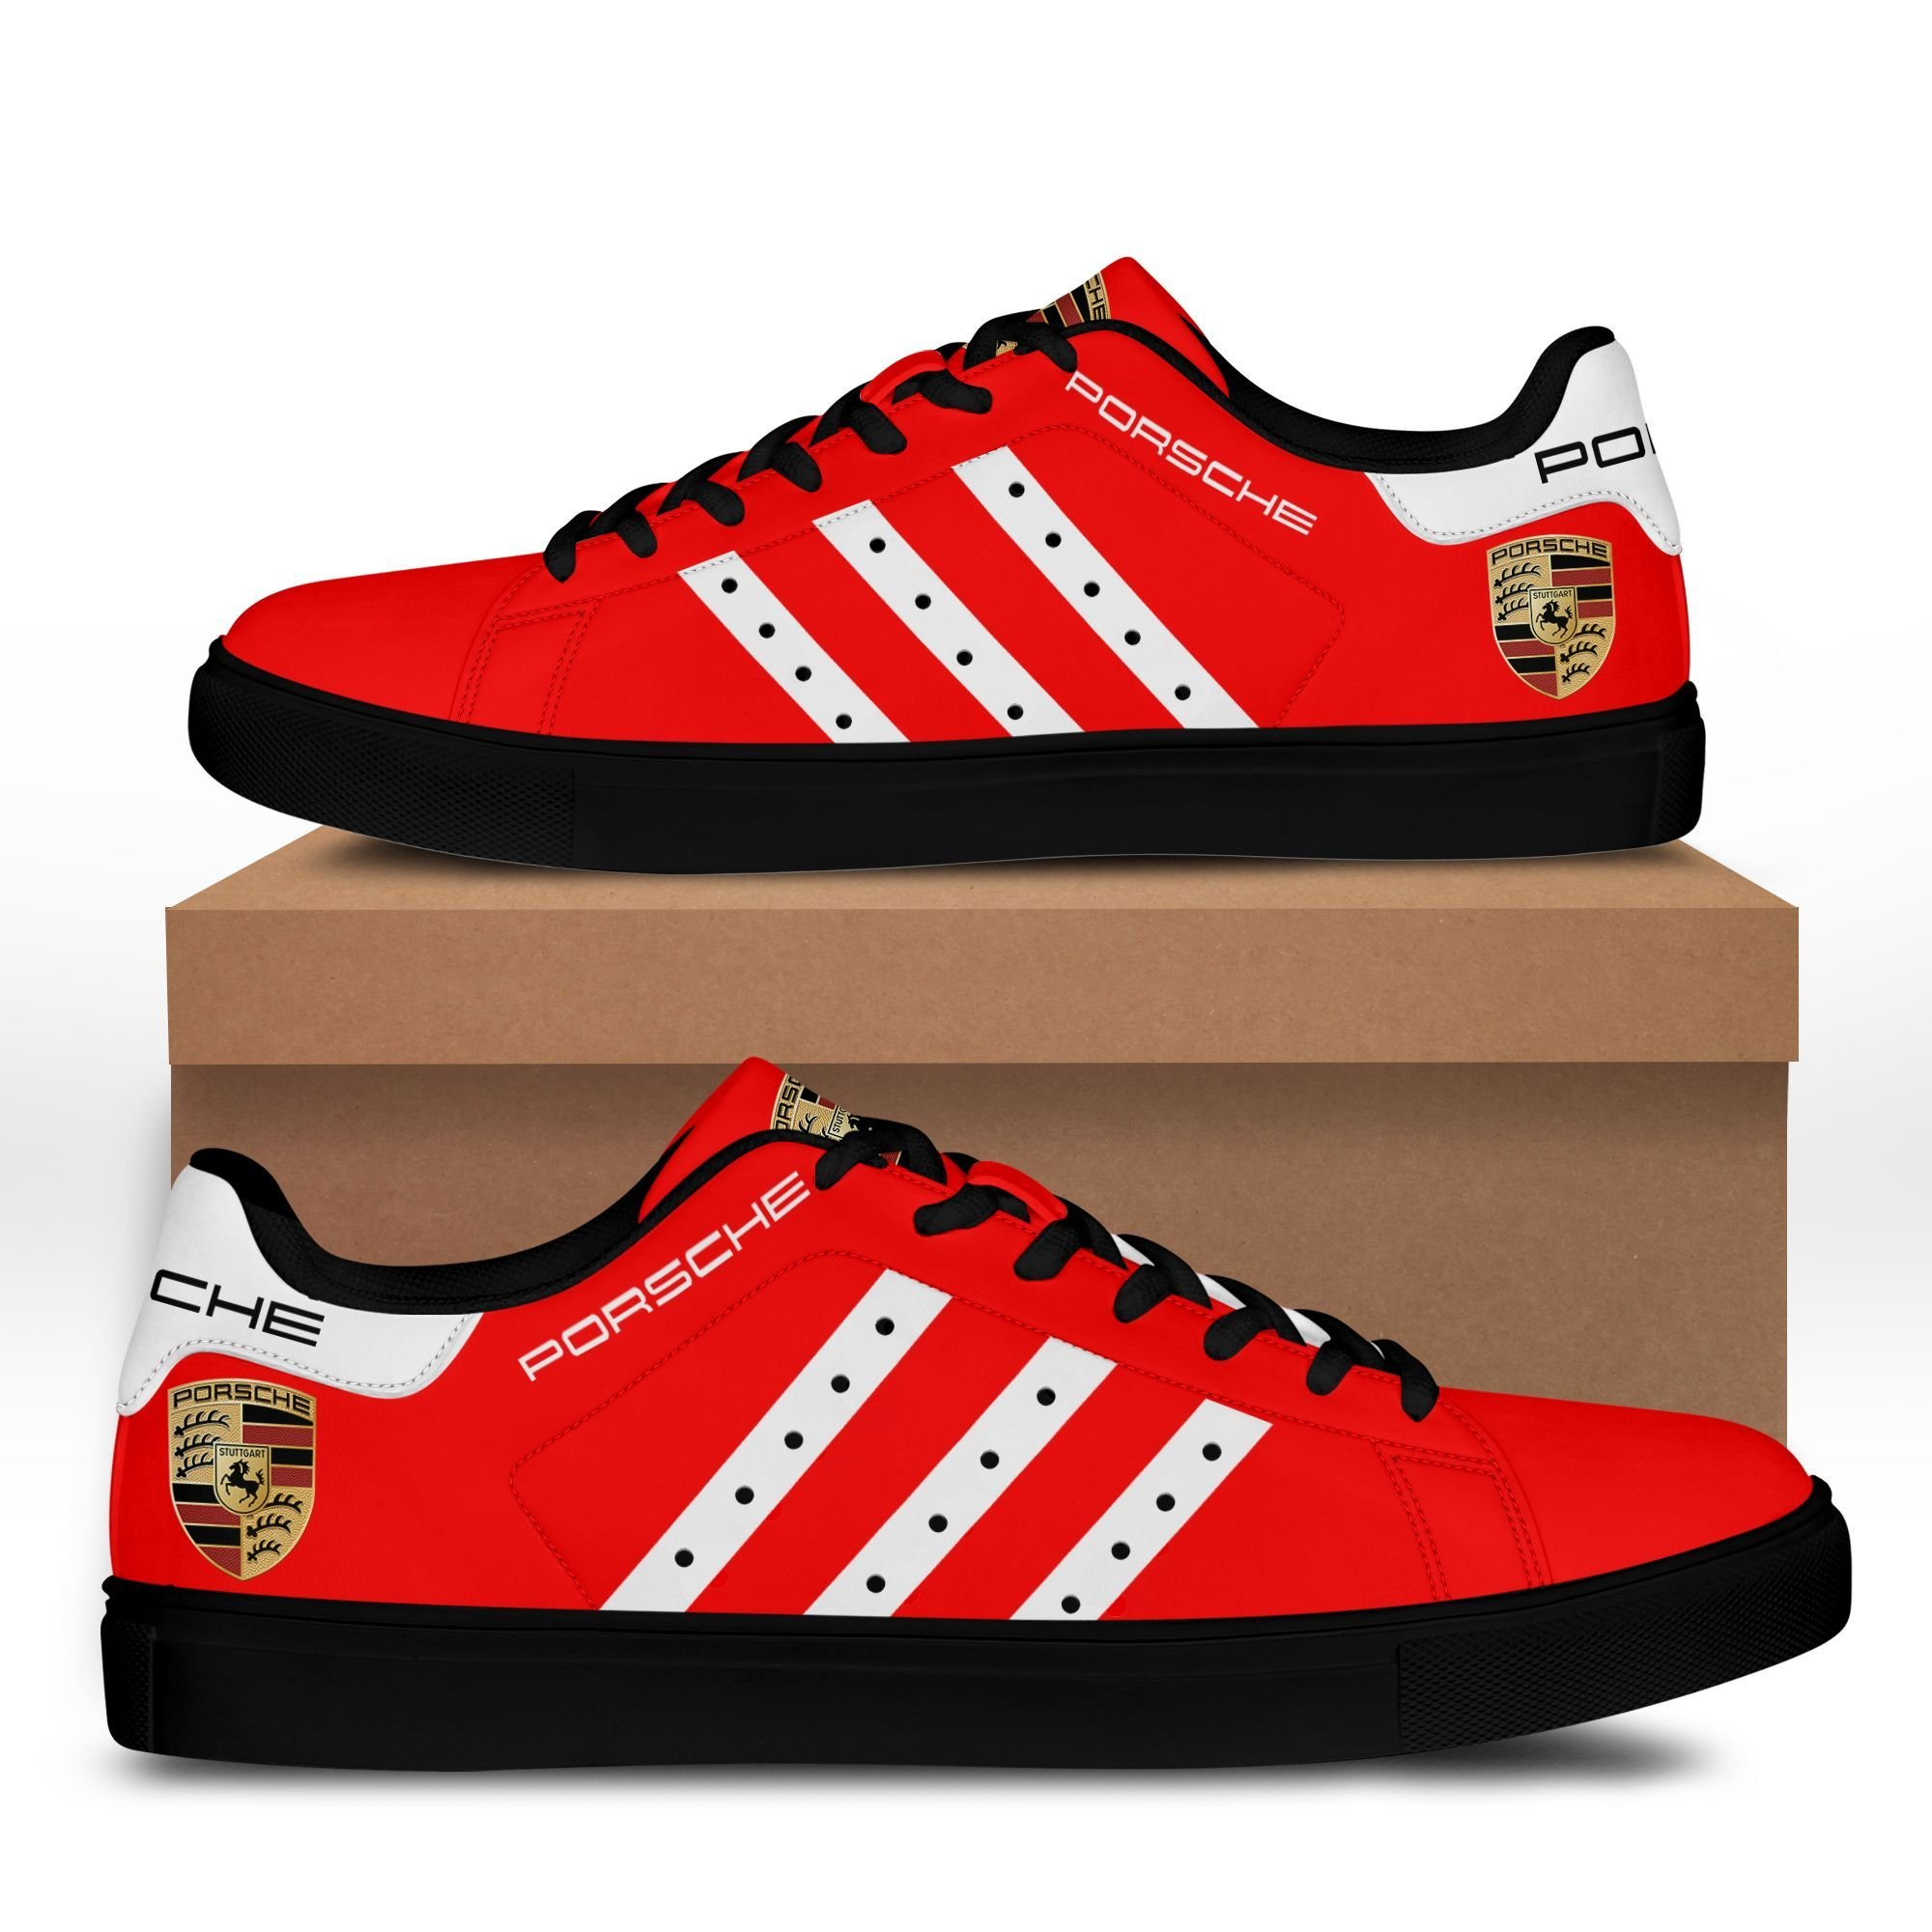 PORSCHE 911 red version Stan Smith Shoes